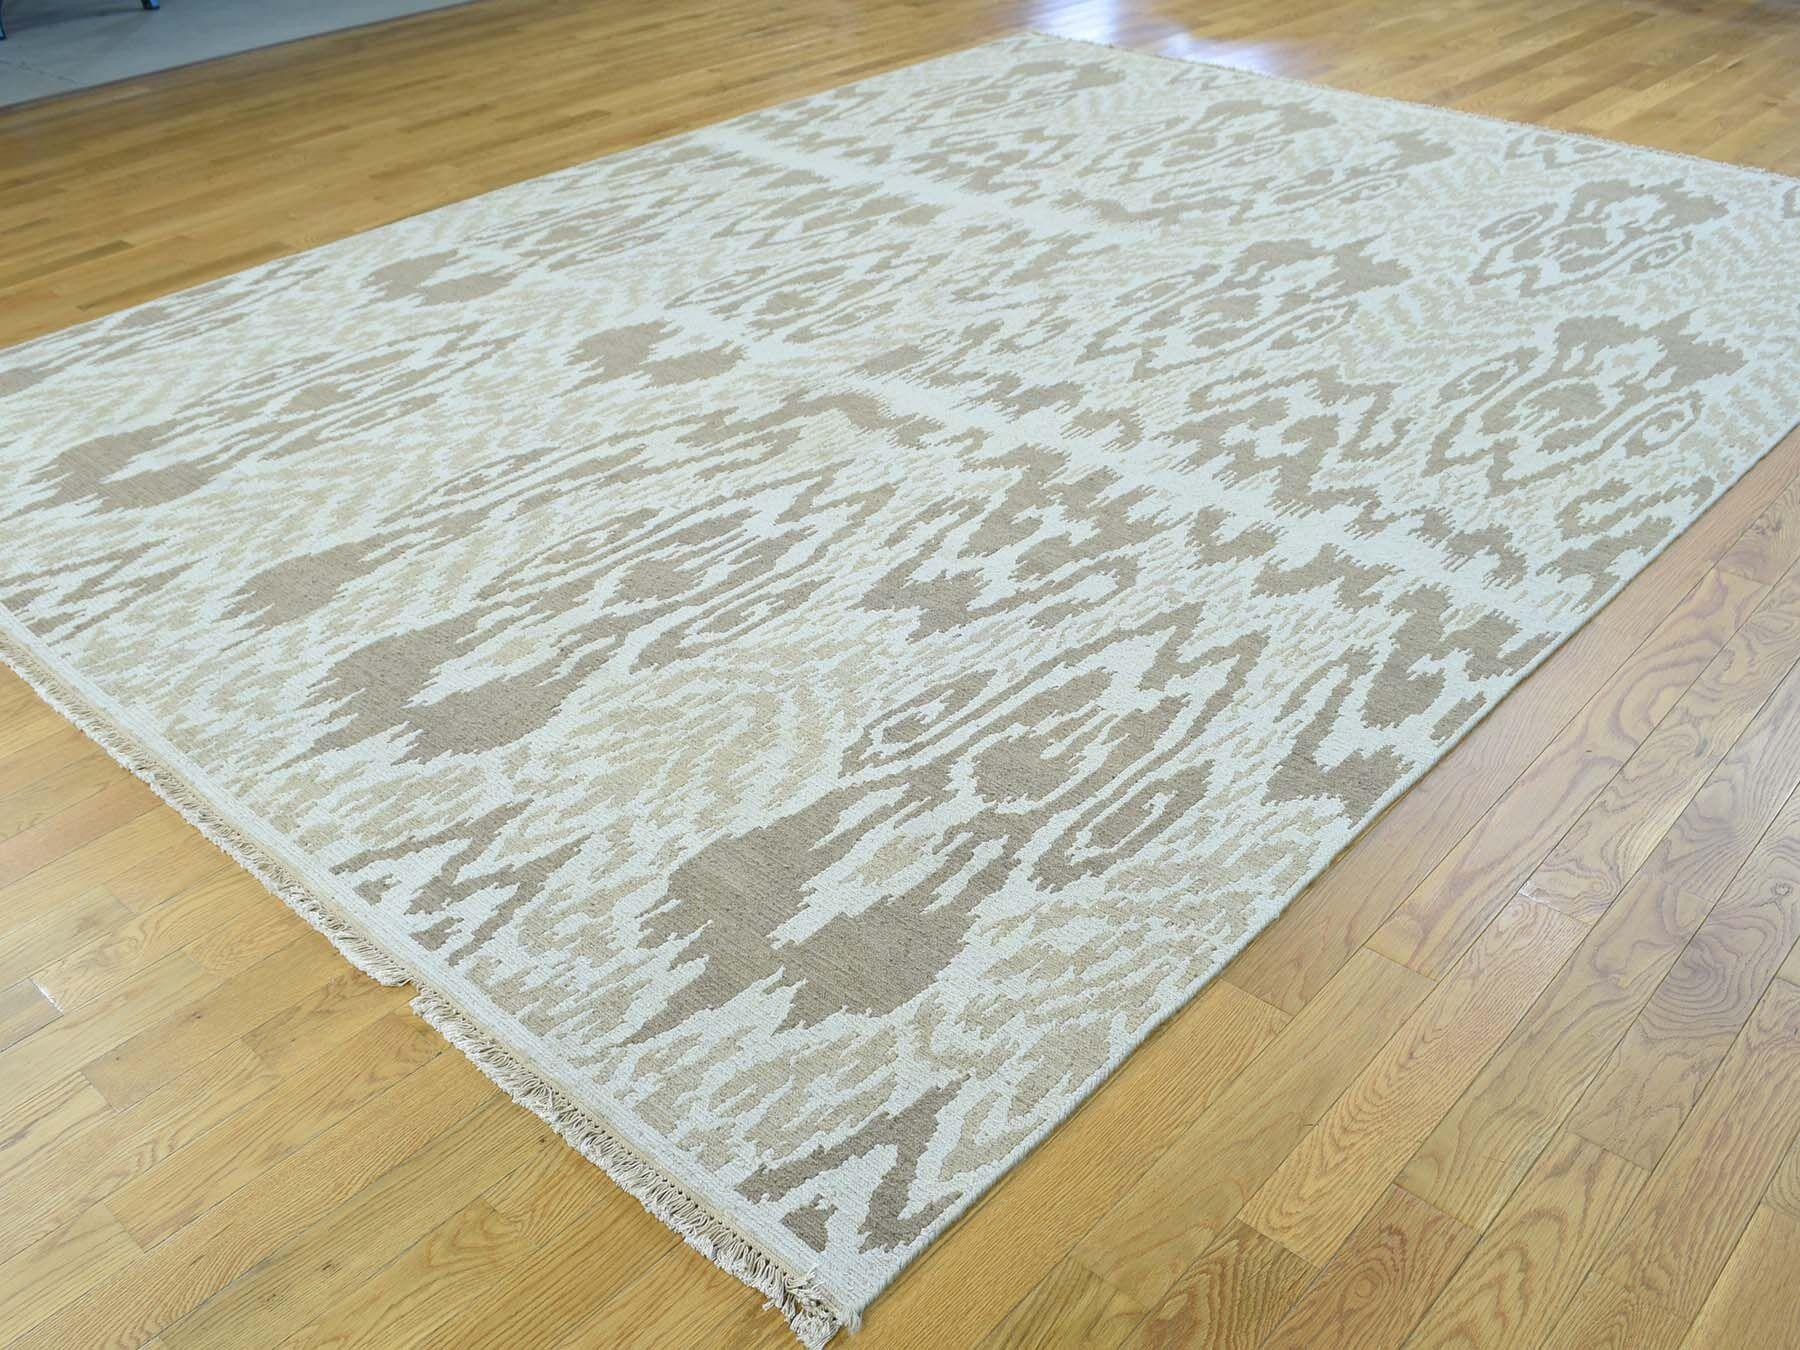 One-of-a-Kind Briele Ikat Design Soumak Handwoven Ivory Wool Area Rug